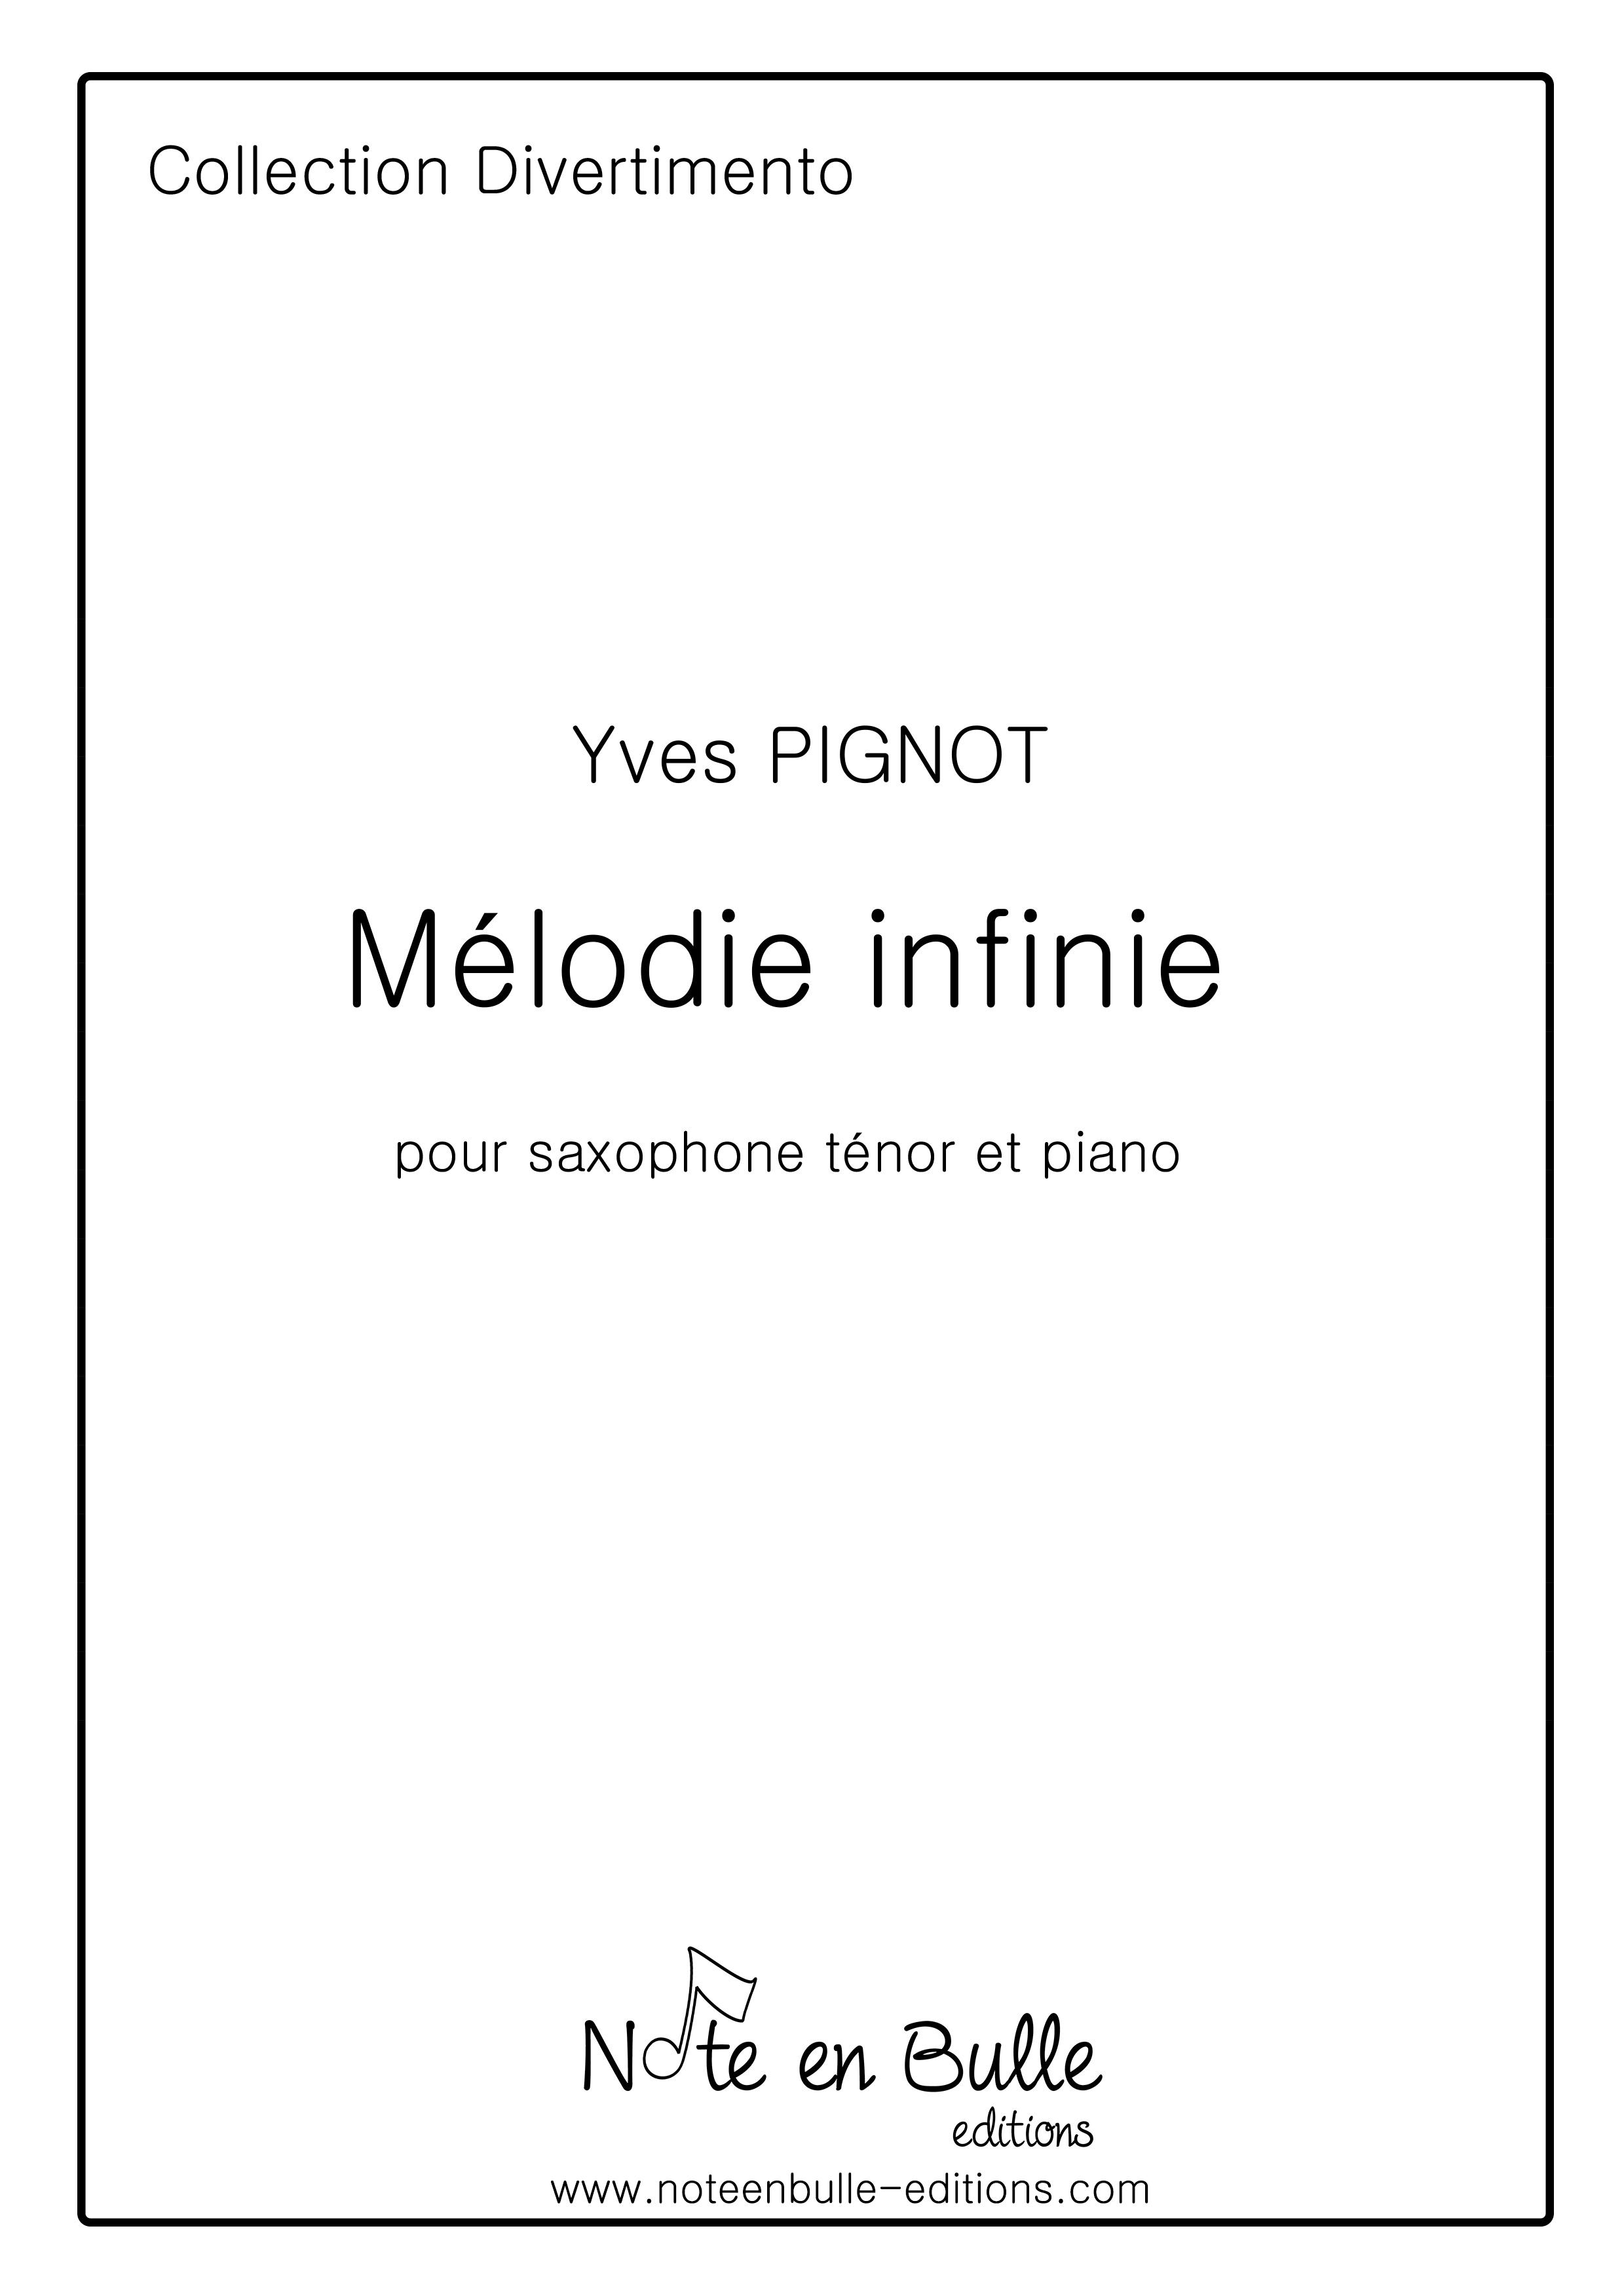 Melodie-infinie-YPignot_ST_ed-6.jpg